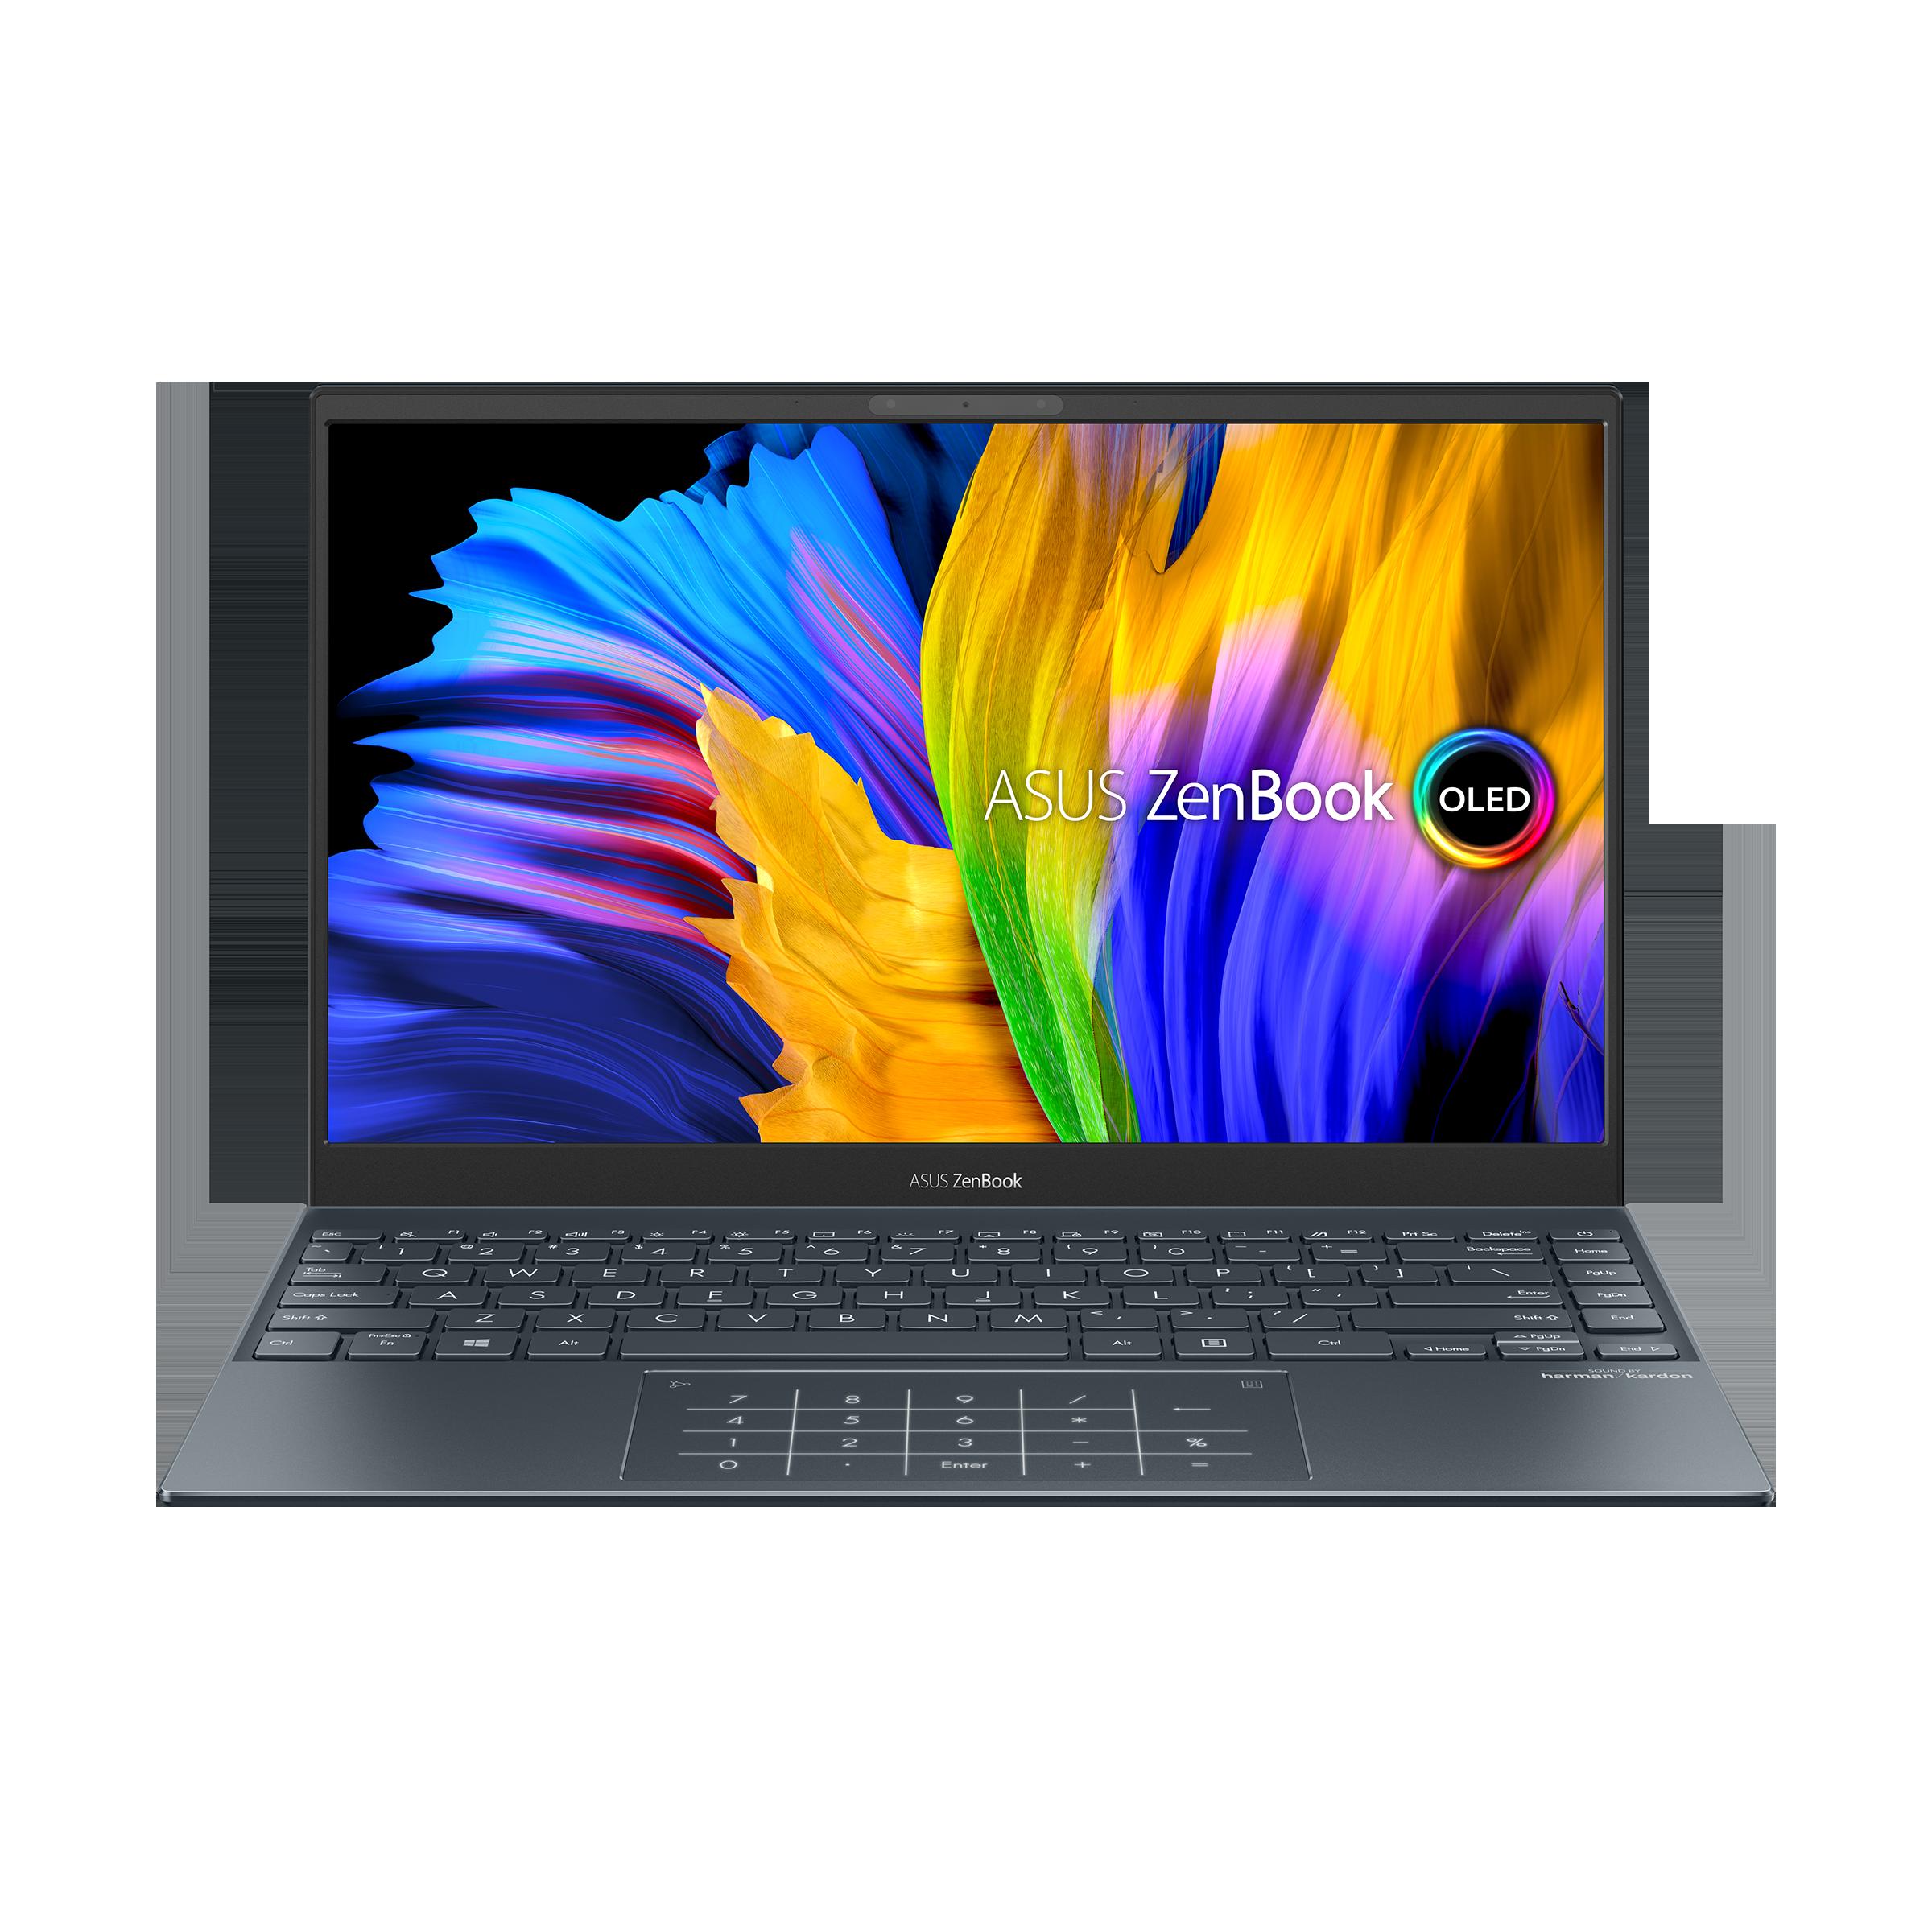 ZenBook 13 OLED (UX325, 11th Gen Intel)